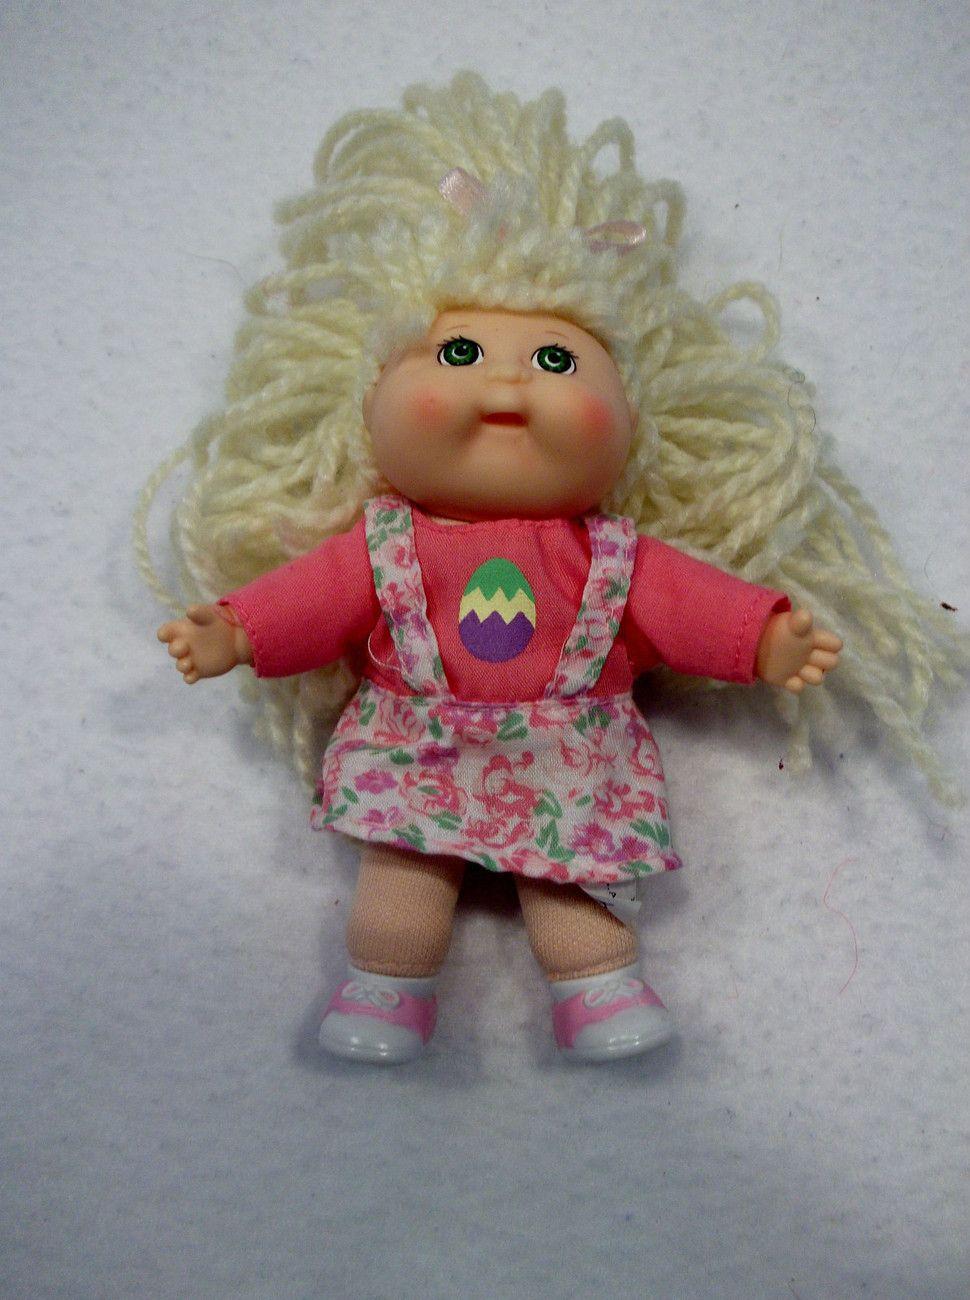 1996 Mattel Mini Cabbage Patch Doll 5 Xavier Roberts 3 Cabbage Patch Dolls Cabbage Patch Kids Cabbage Patch